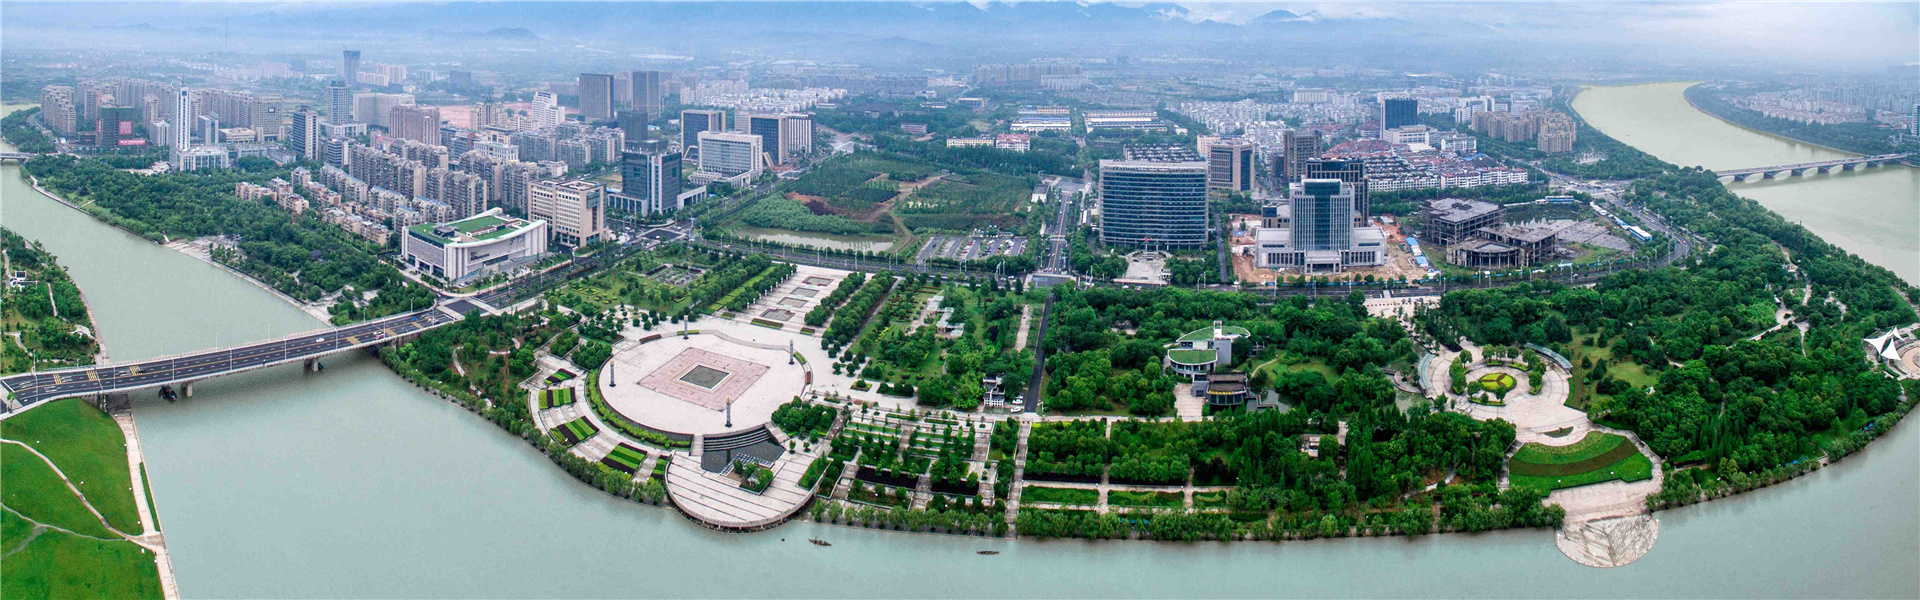 Quzhou promotes Big Garden development with beautiful landscapes